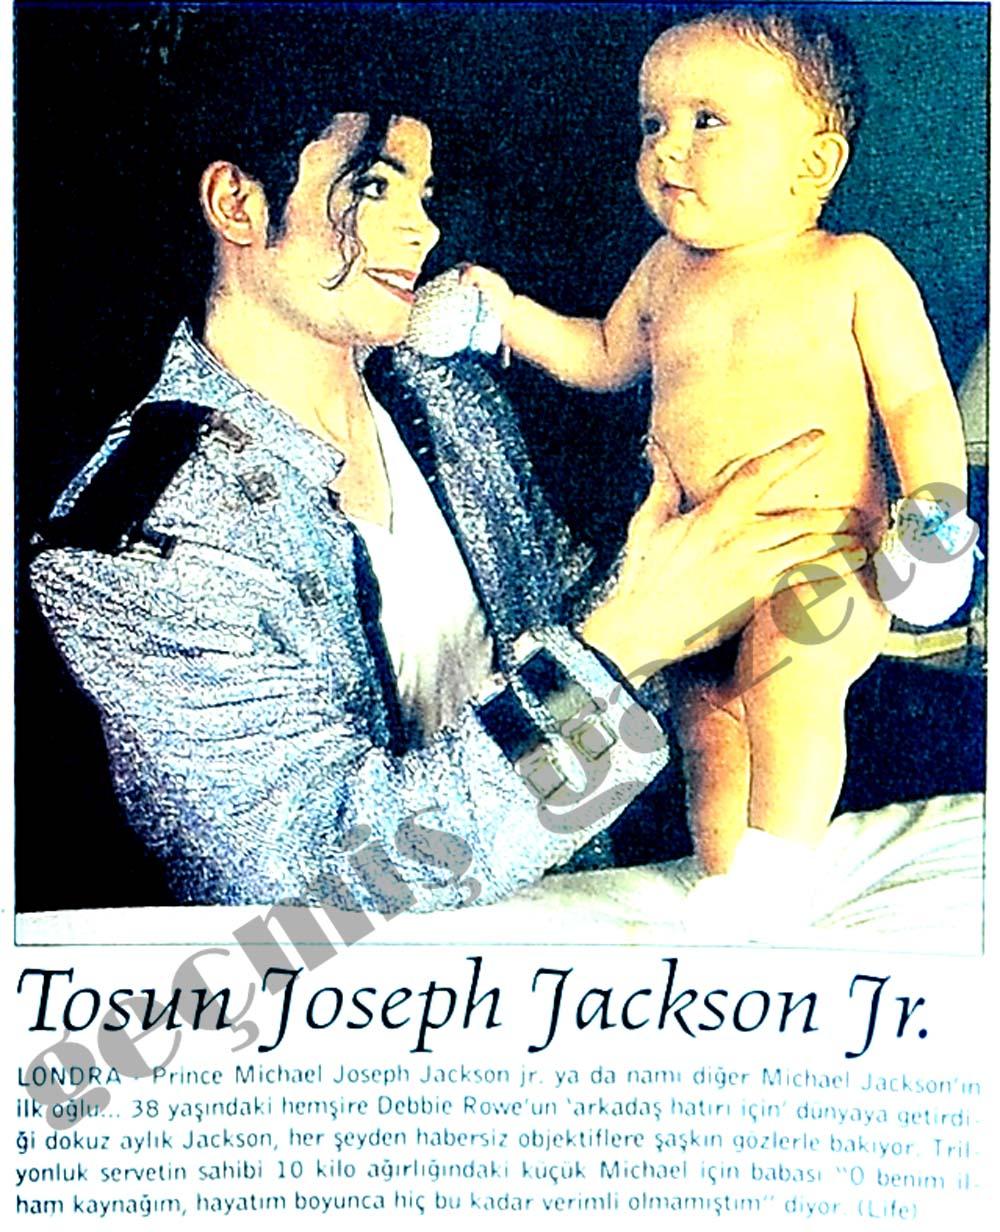 Tosun Joseph Jackson Jr.